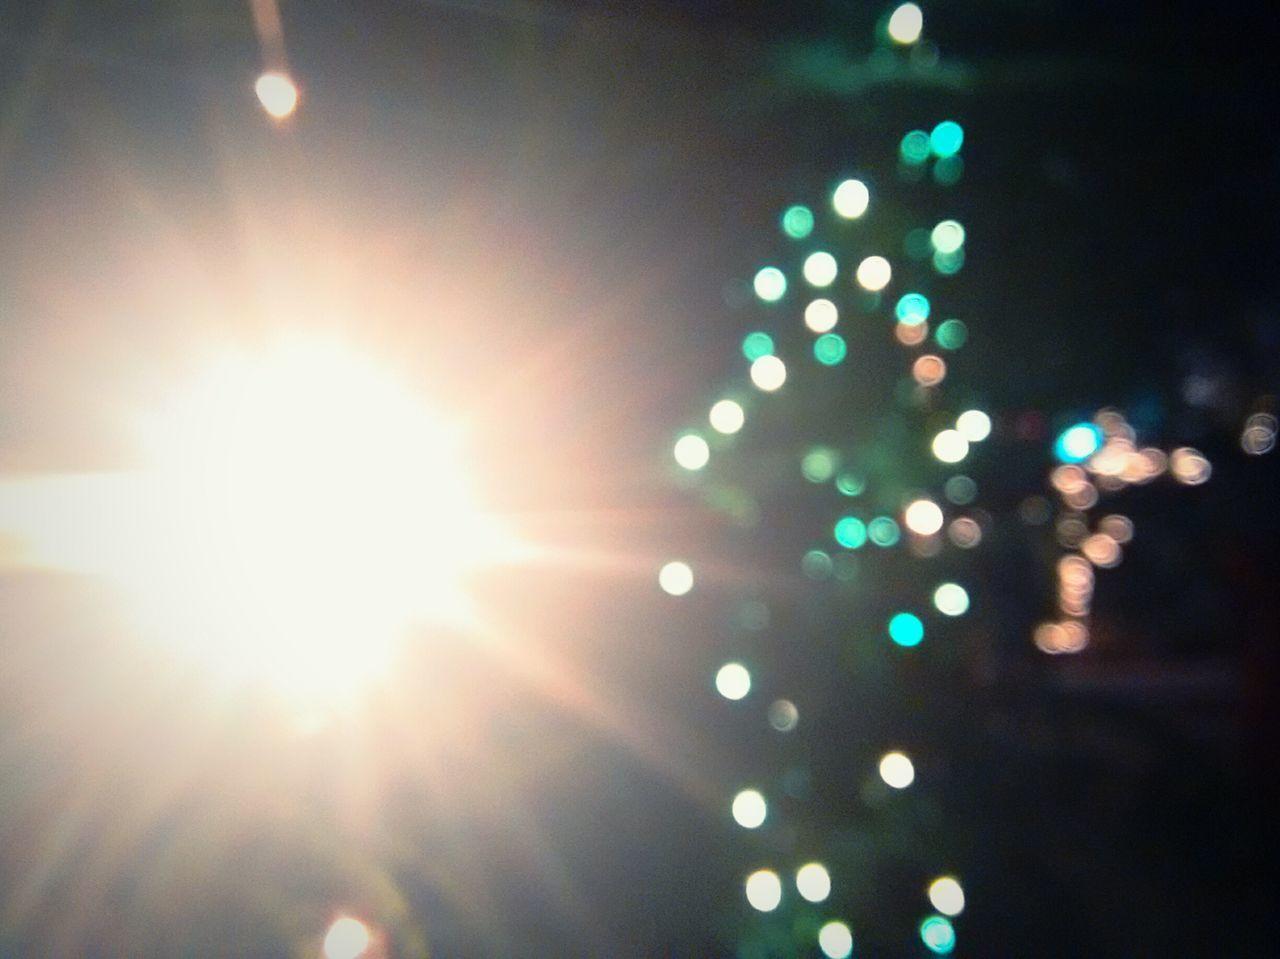 Christmas Bokeh balls. Life Lights Christmas Lights Bokeh Bokehlicious Bokeh Balls Night Passion EyeEm Gallery EyeEm Best Shots Streetphotography Christmas Around The World